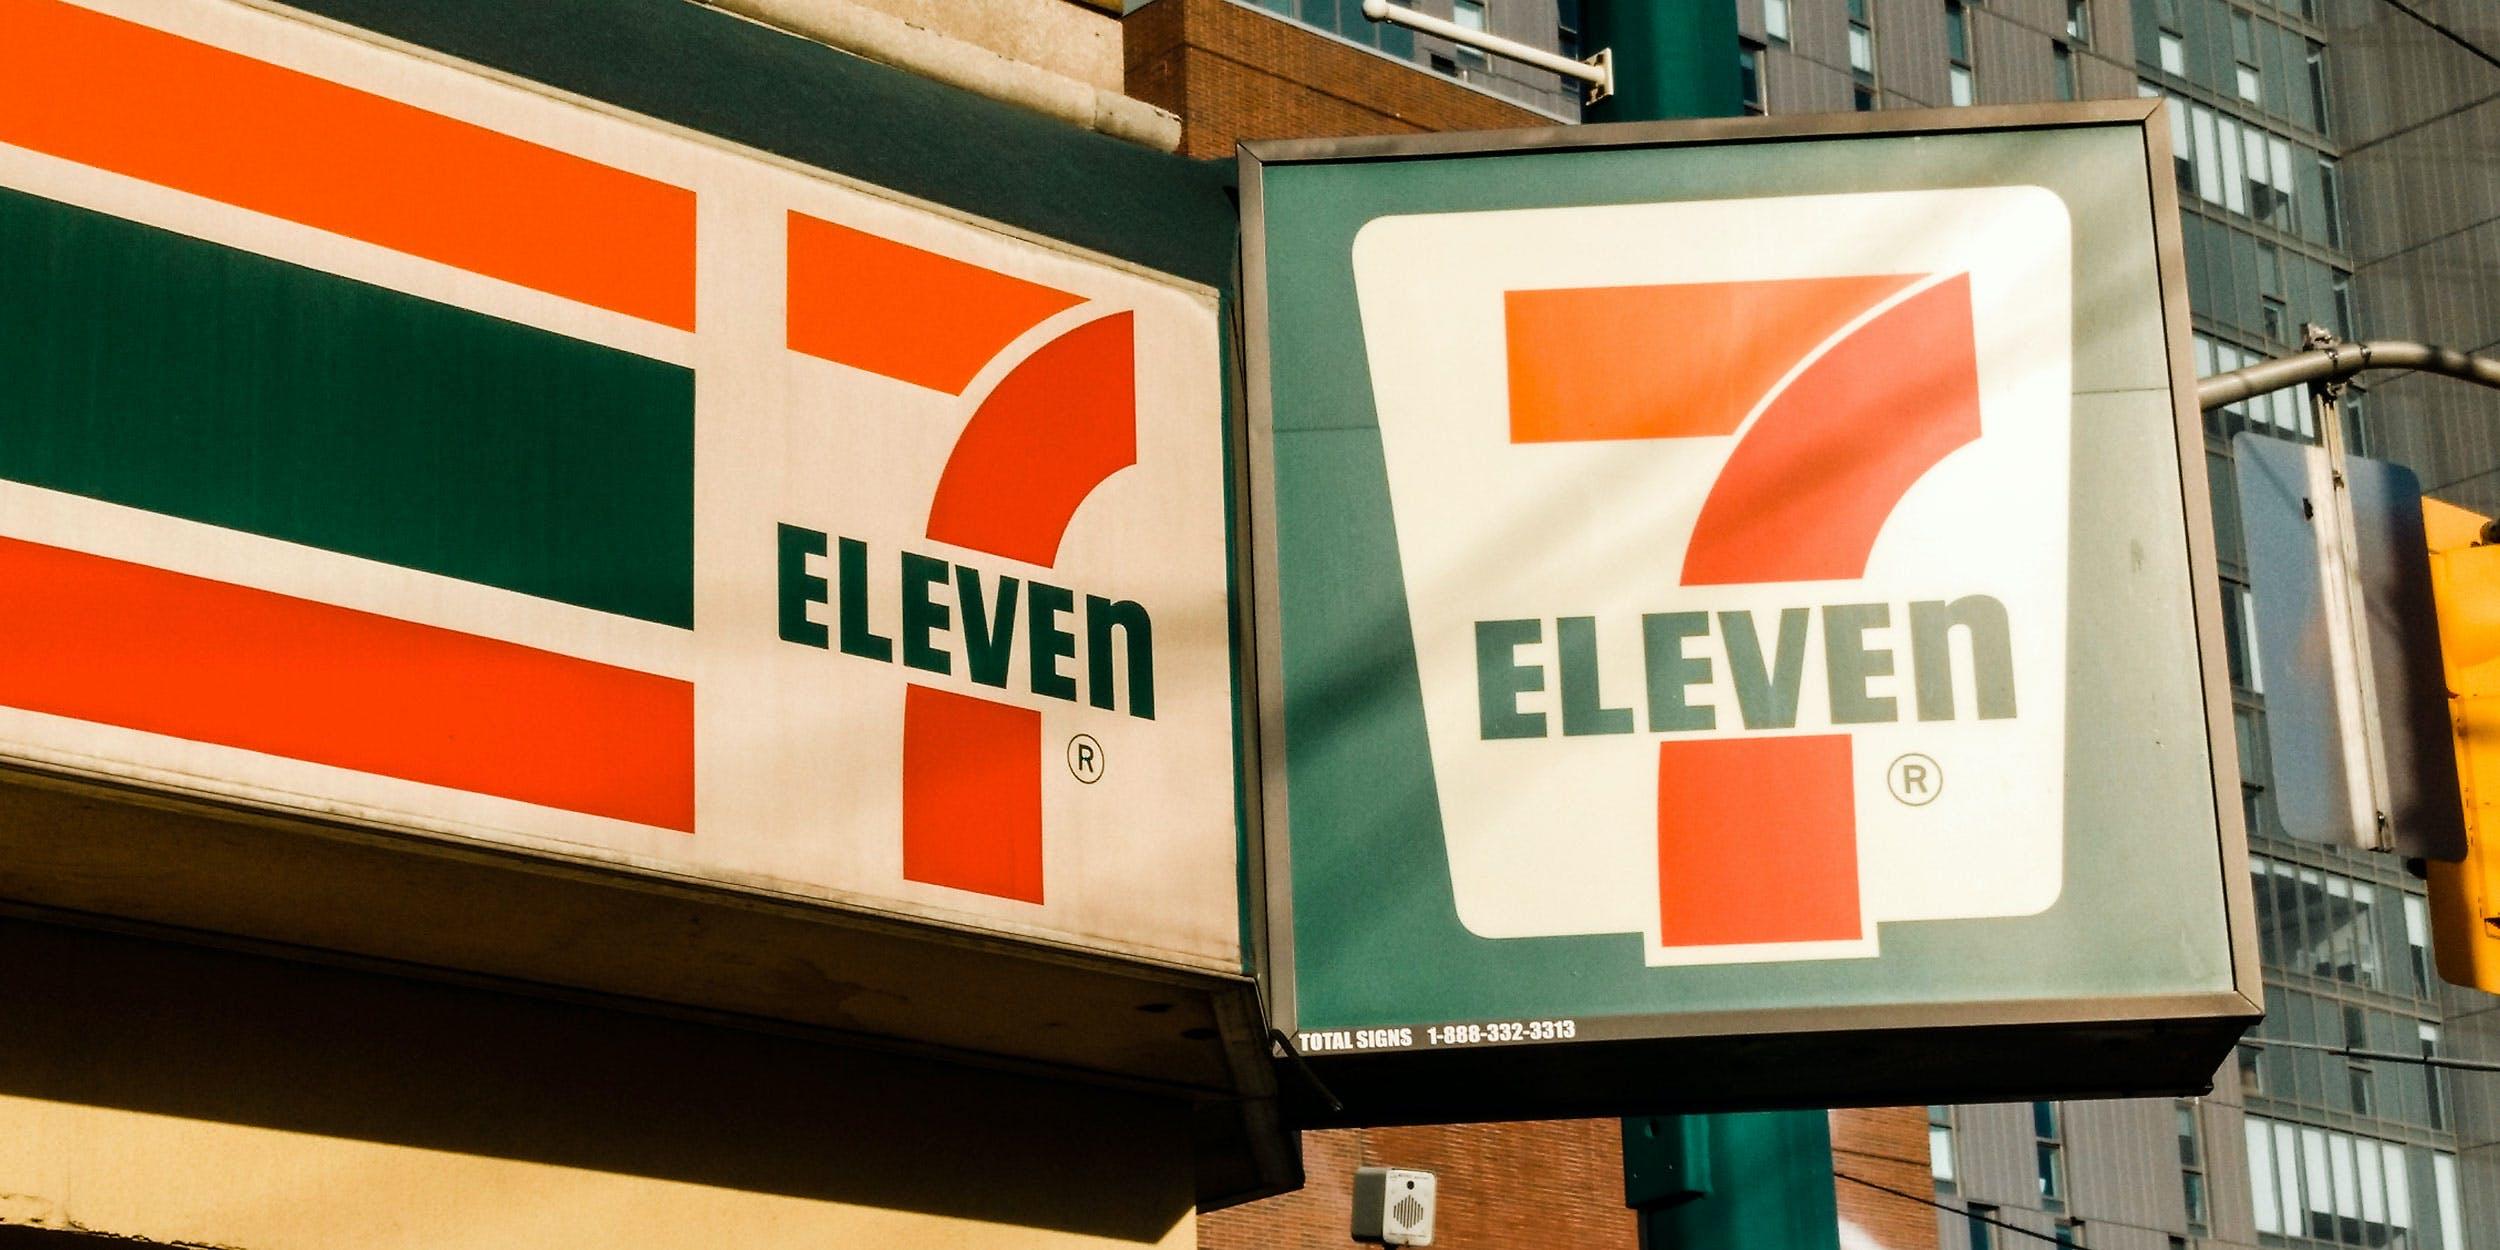 7-Eleven store denies rumors it will sell CBD oils